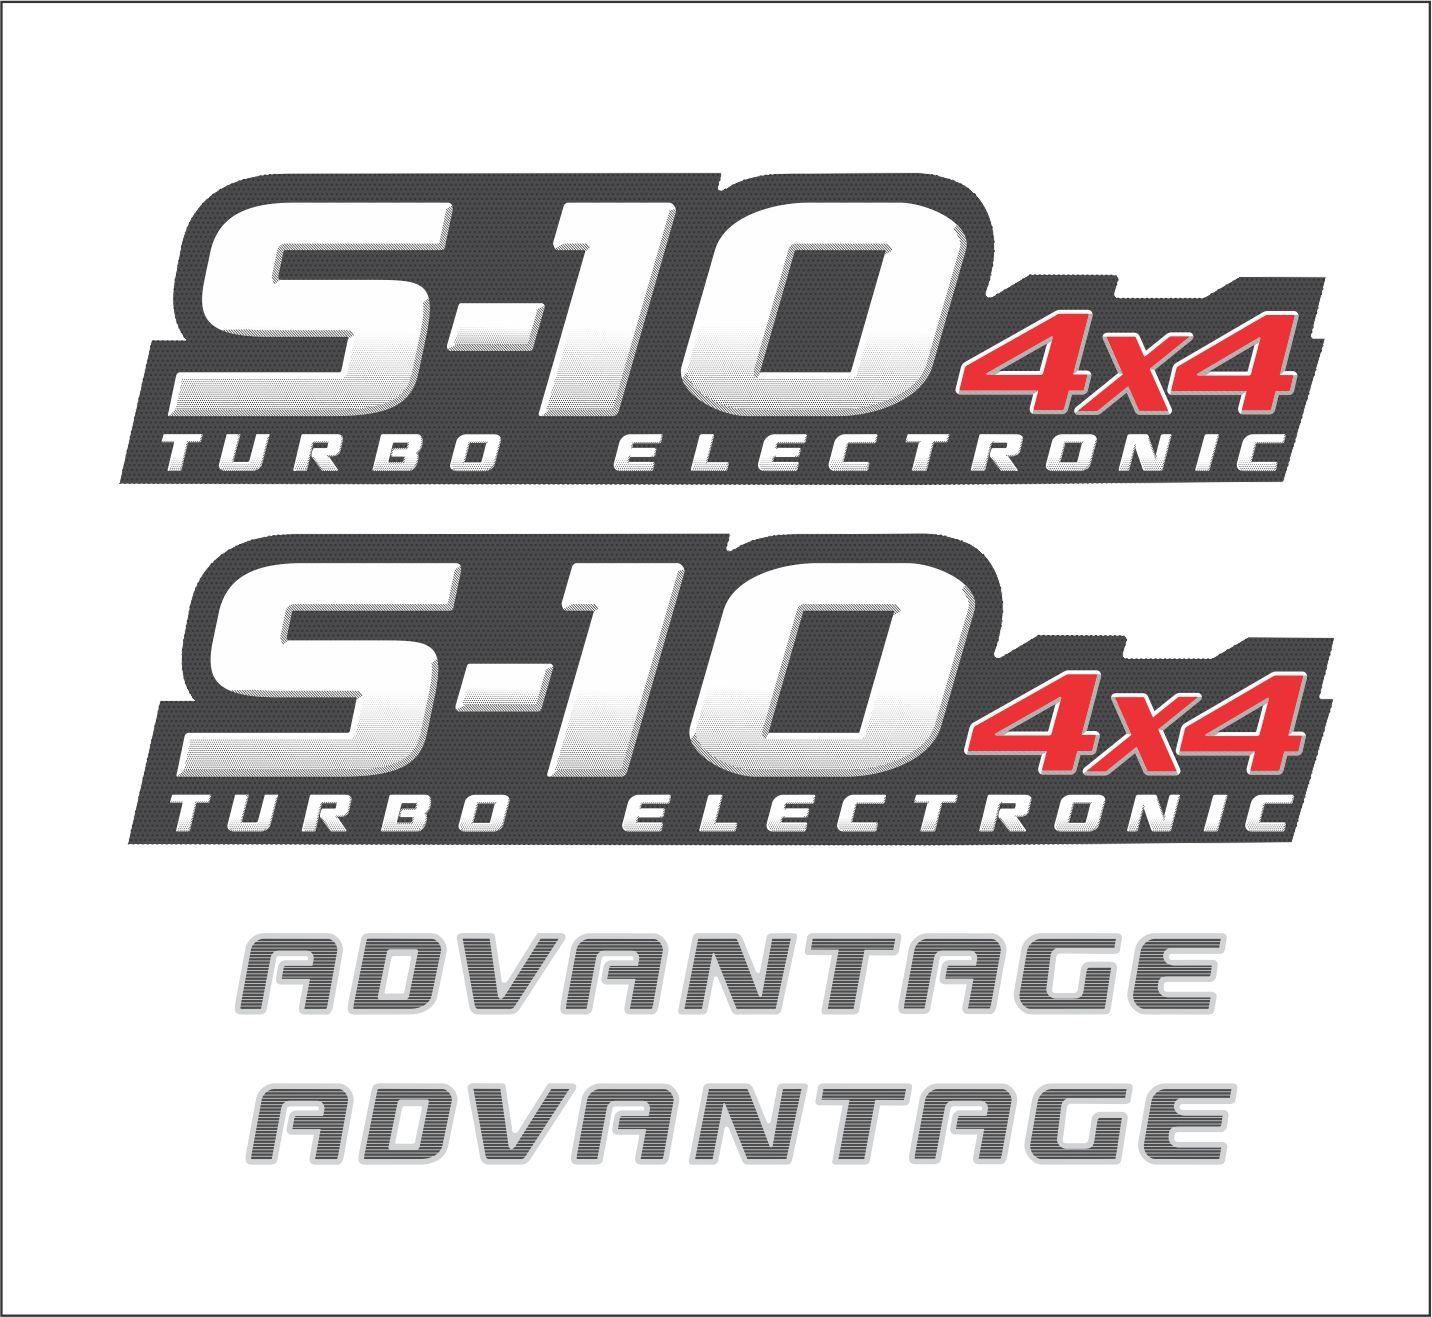 Kit Adesivo Chevrolet S10 Advantage 4x4 2009 A 2011 S10kit21